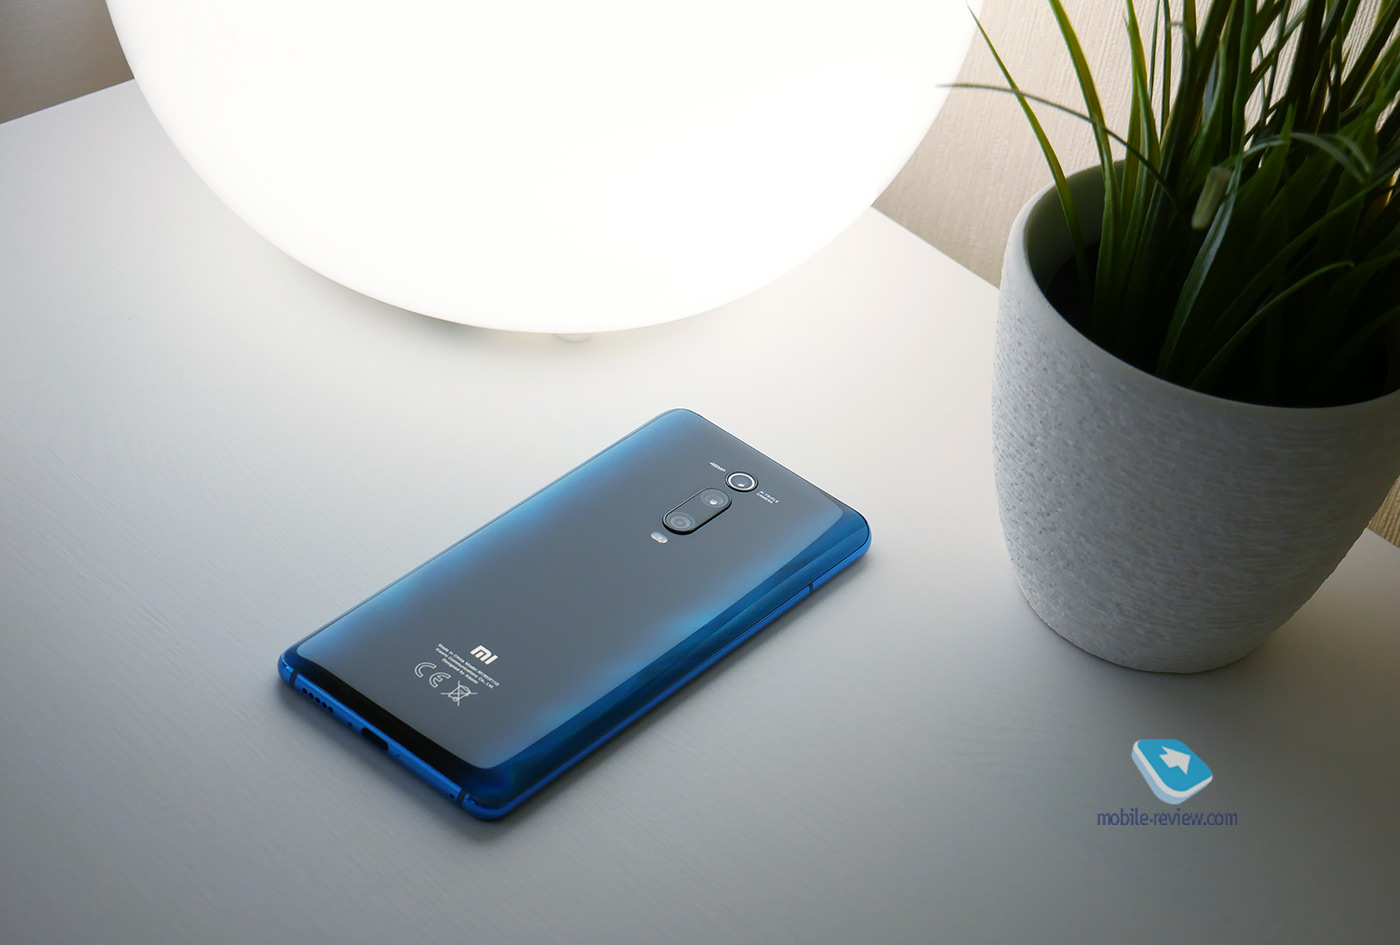 Mobile-review.com 5 фишек Xiaomi Mi 9T Pro xiaomi mi 9t pro,обзор,смартфоны,технологии